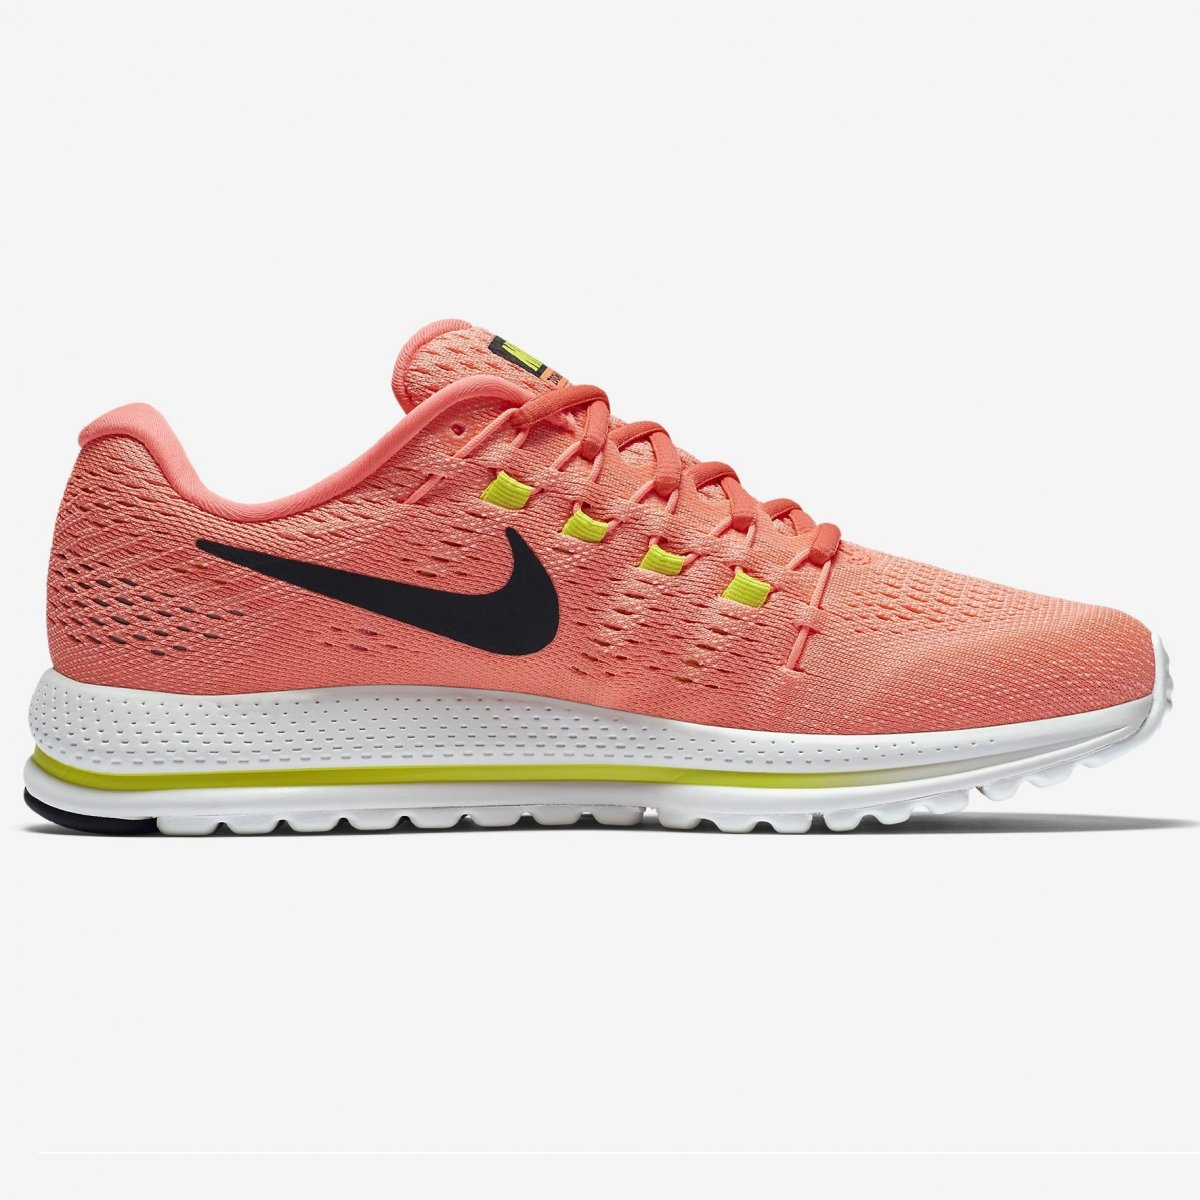 52f8458e07 Passe o mouse na imagem para ampliar Ampliar imagem. Tênis Nike Wmns Air  Zoom ...